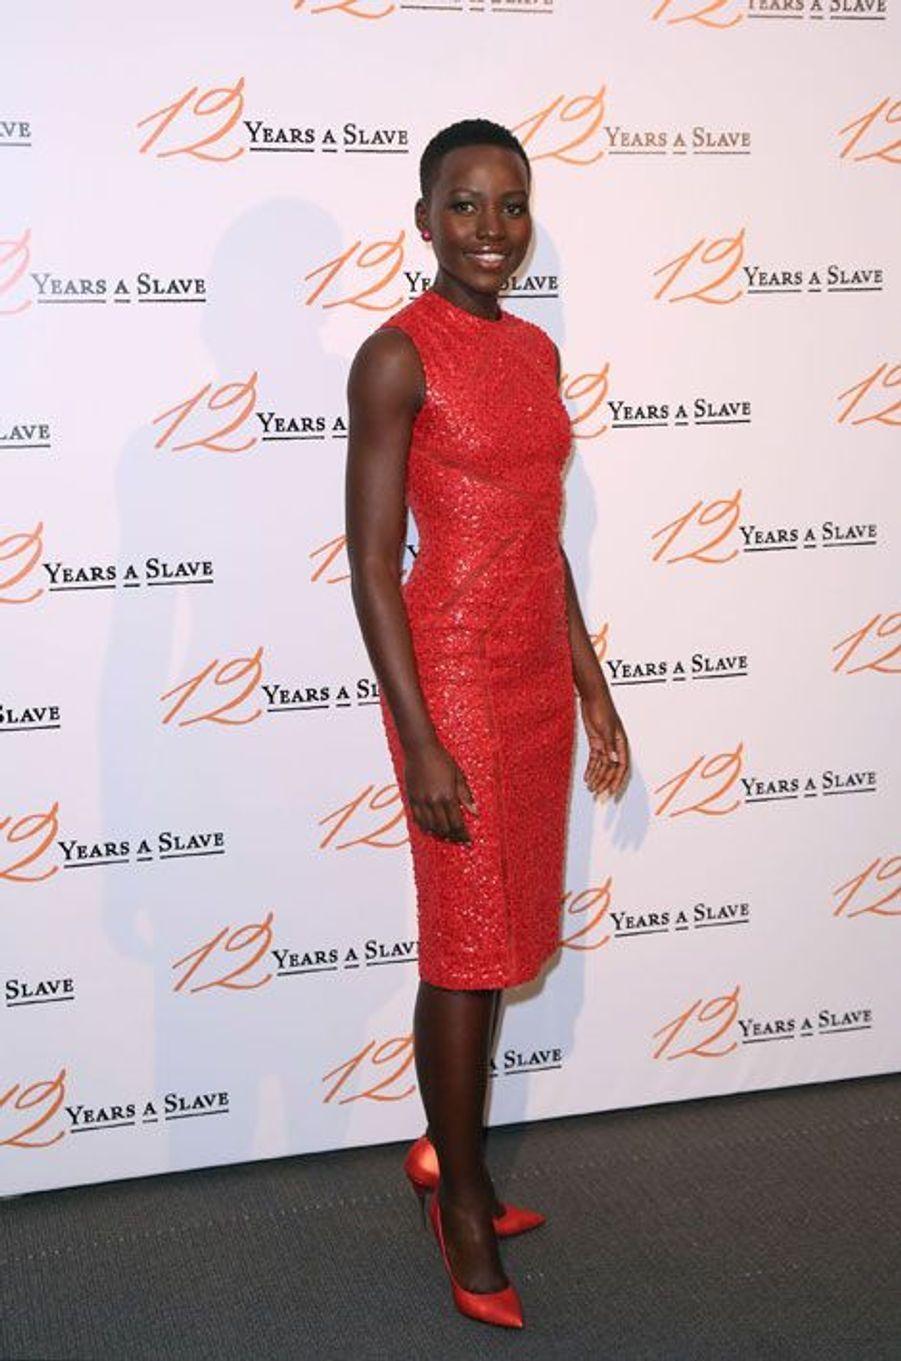 Les plus beaux looks de Lupita Nyong'o